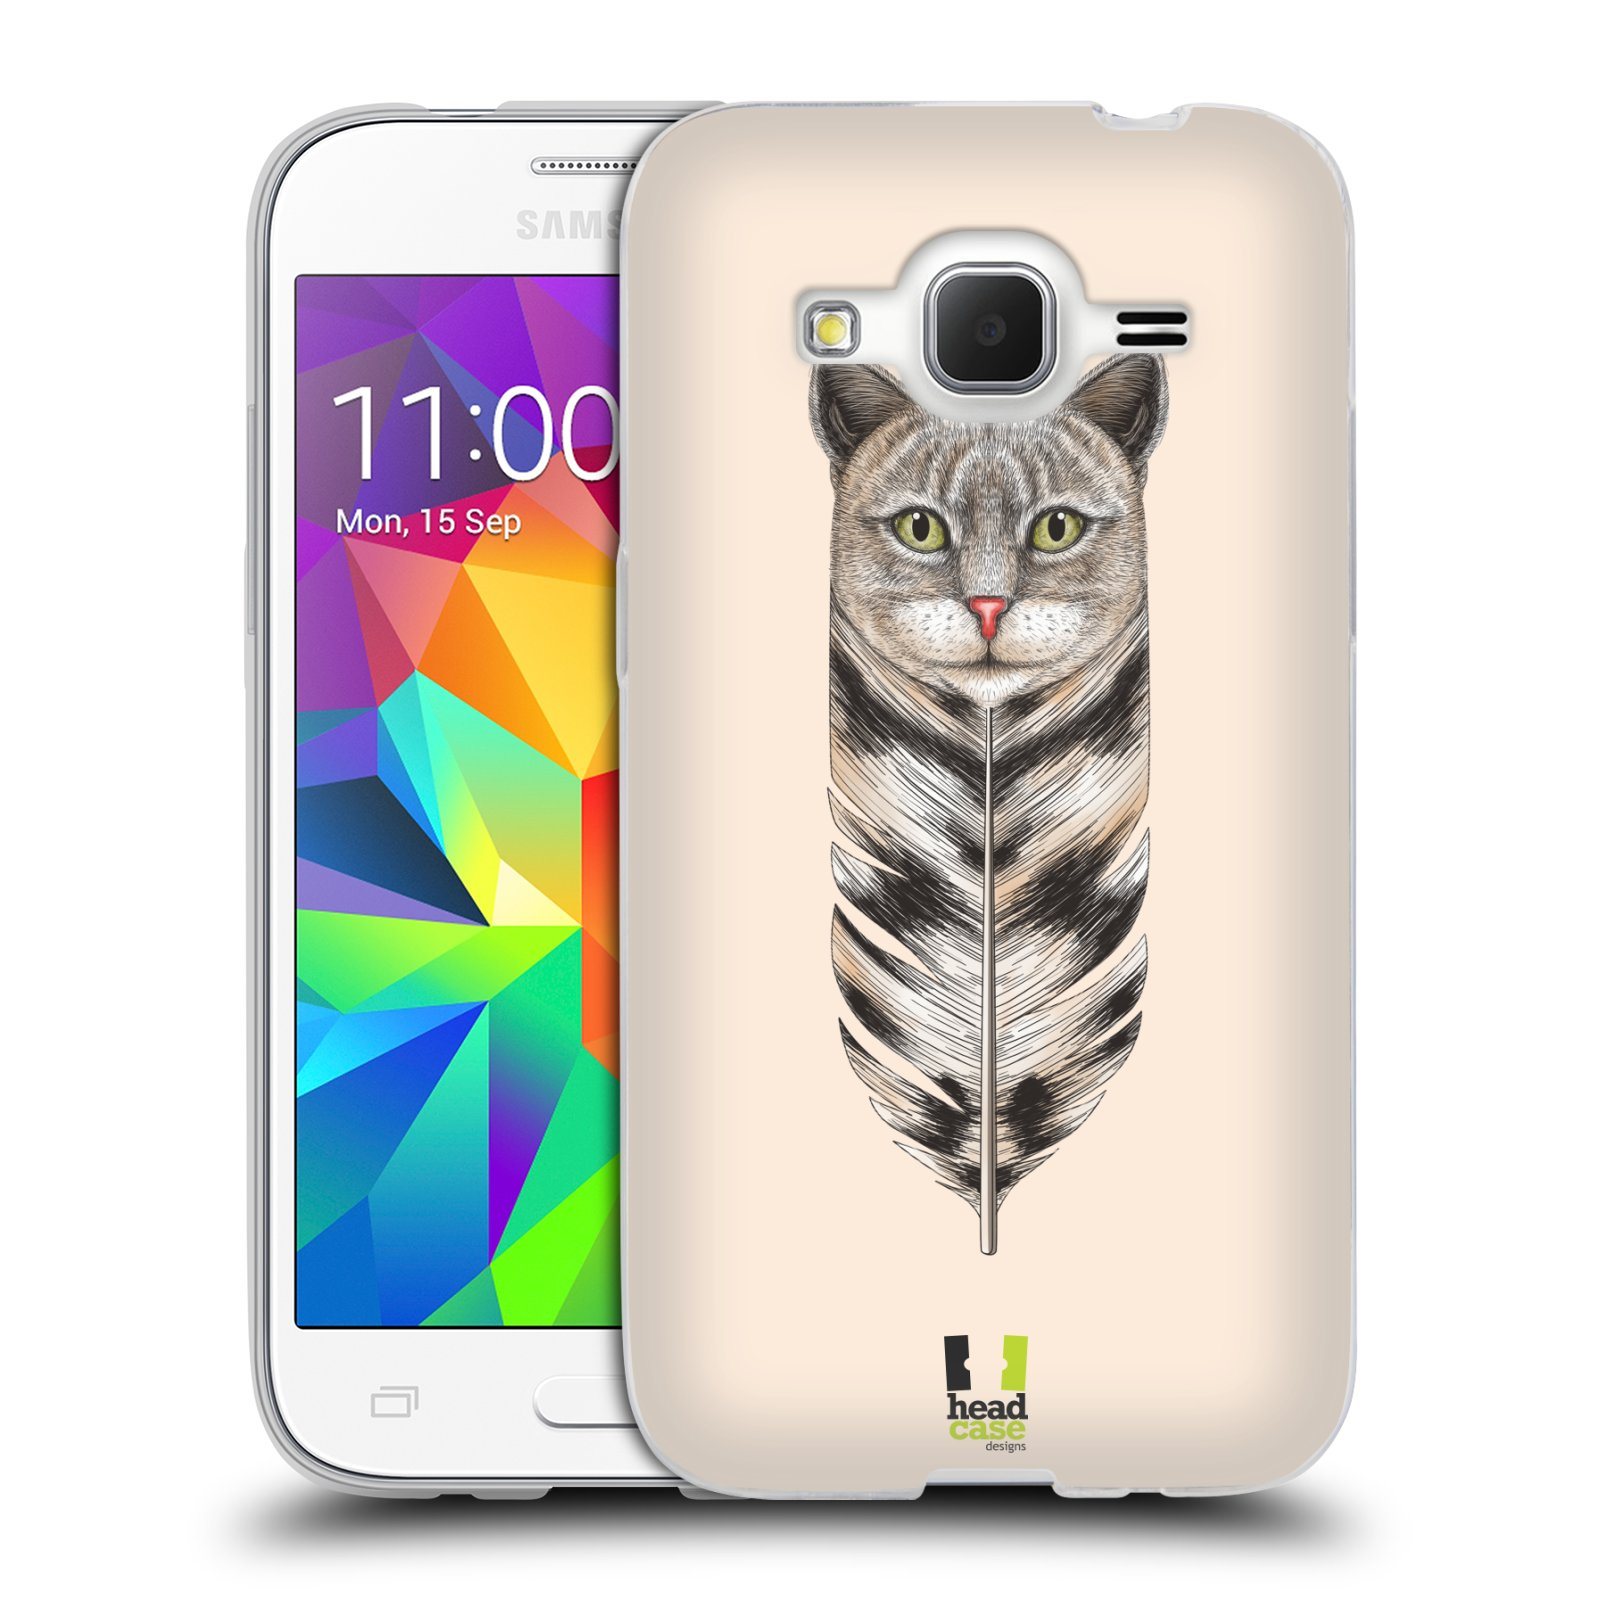 Silikonové pouzdro na mobil Samsung Galaxy Core Prime LTE HEAD CASE PÍRKO KOČKA (Silikonový kryt či obal na mobilní telefon Samsung Galaxy Core Prime LTE SM-G360)